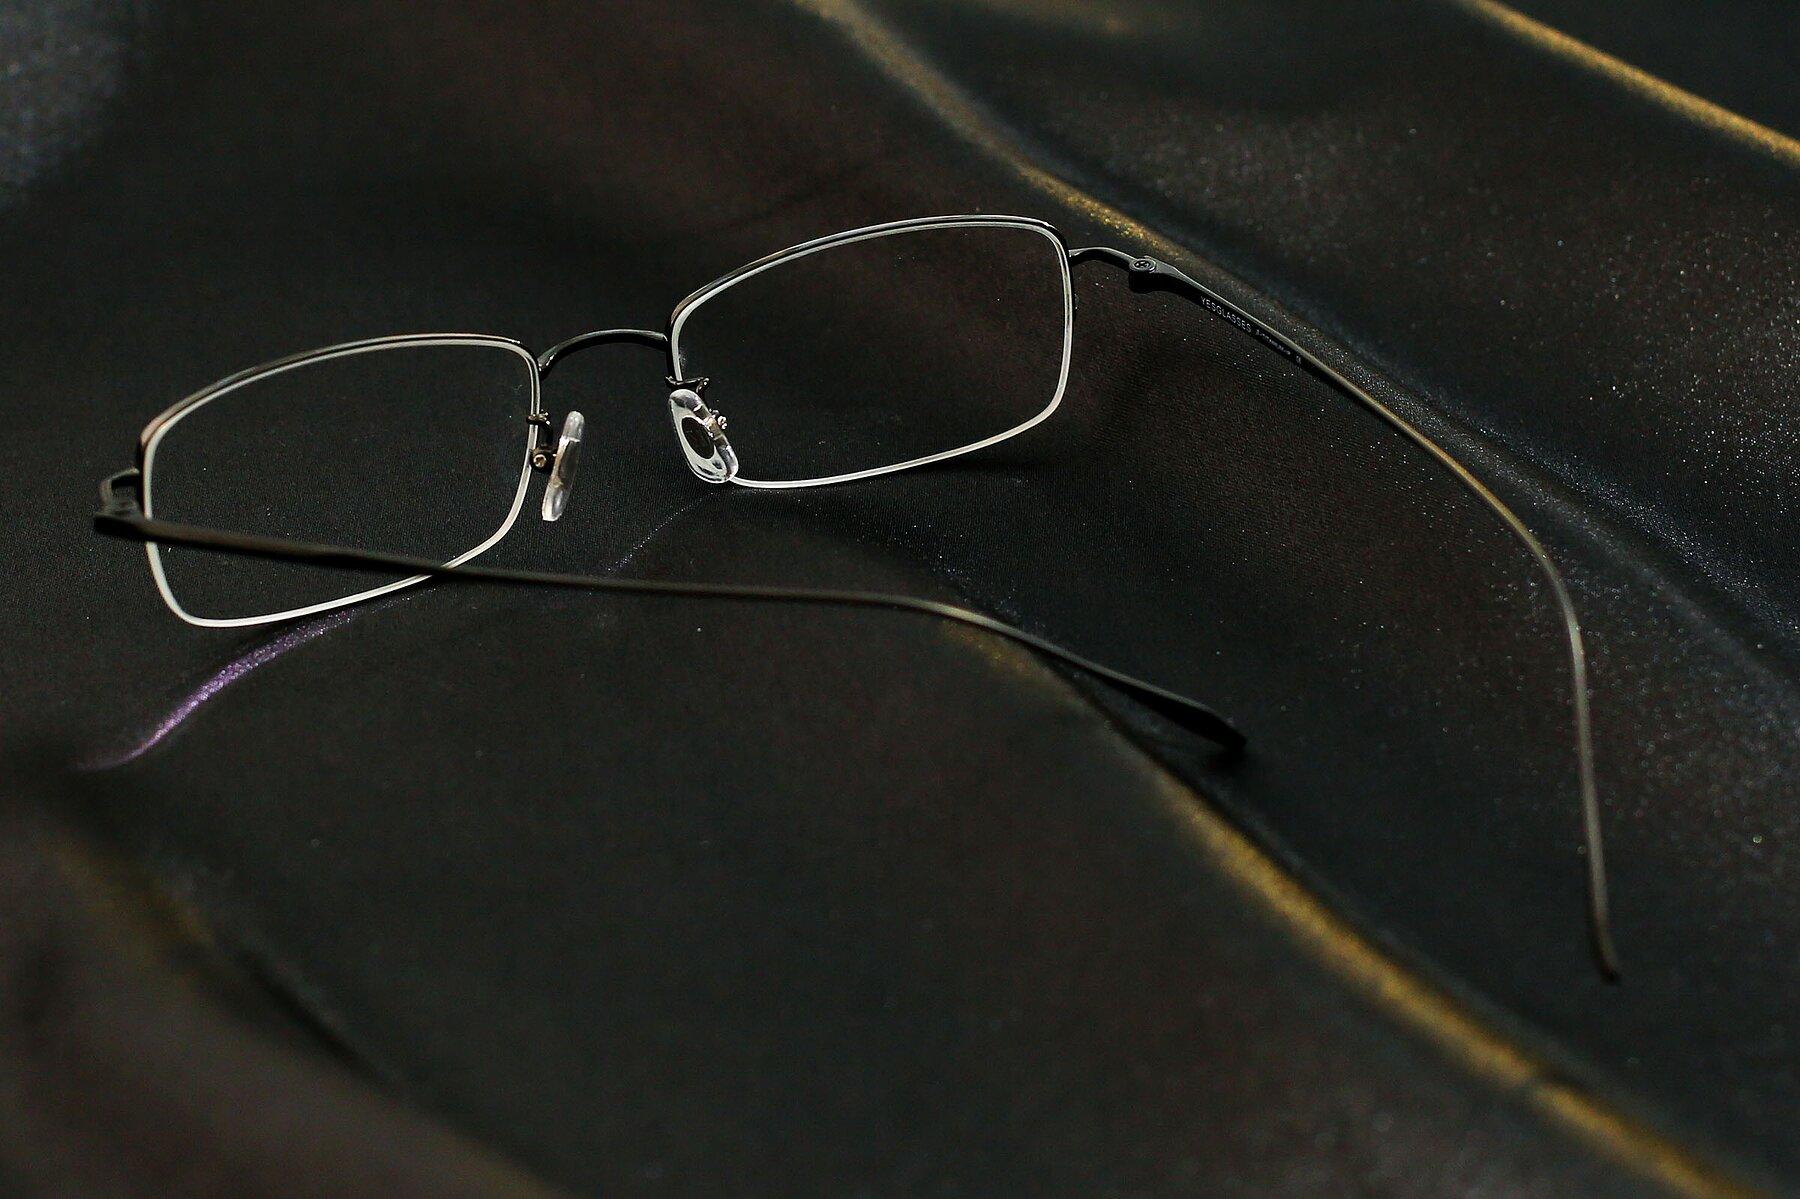 Lifestyle photography #3 of Duke in Matt Black with Clear Eyeglass Lenses